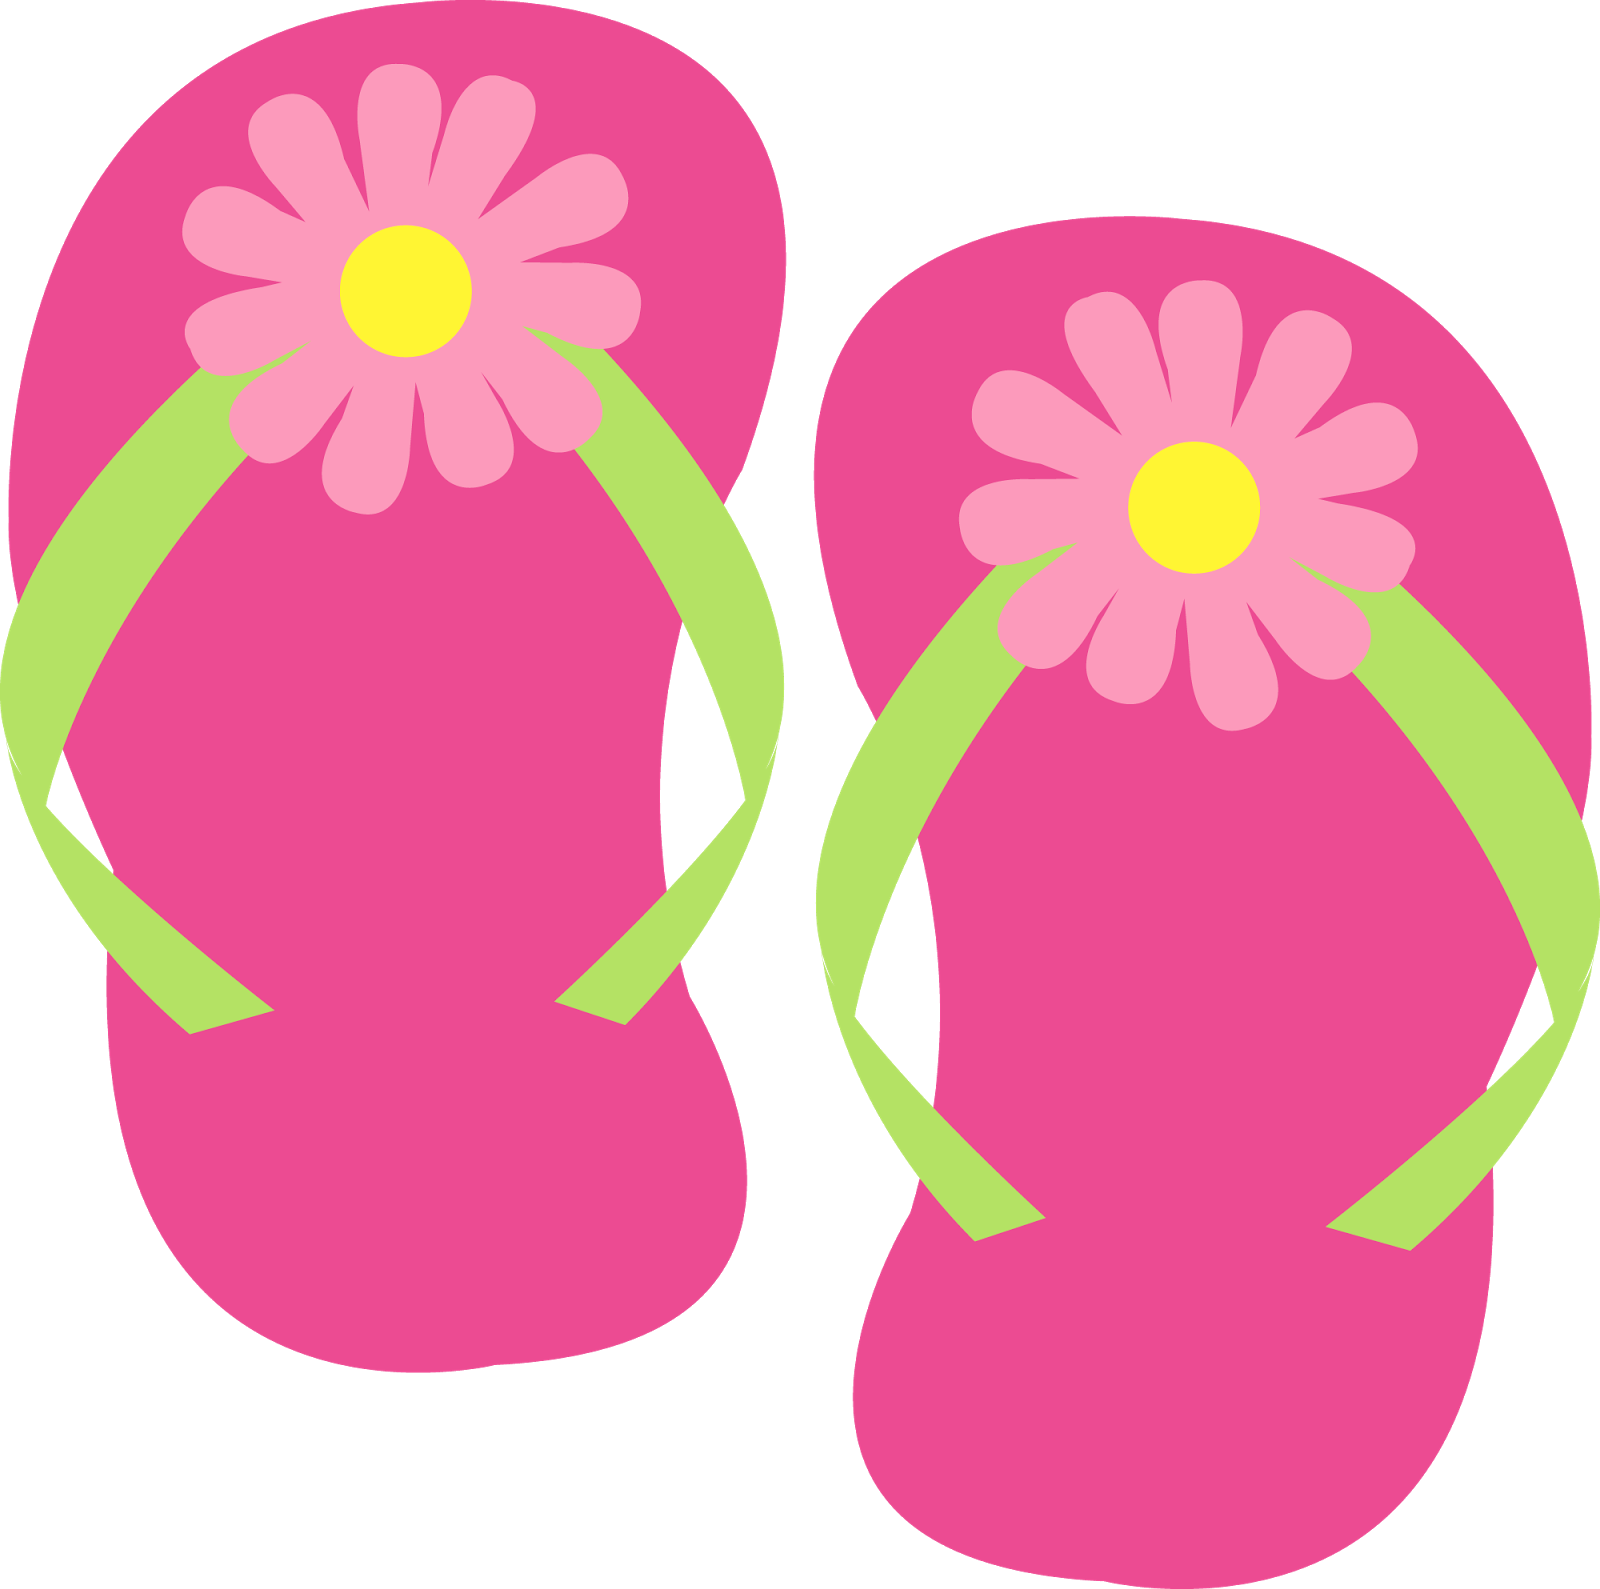 De fiesta spa cumple. Hawaiian clipart flip flop